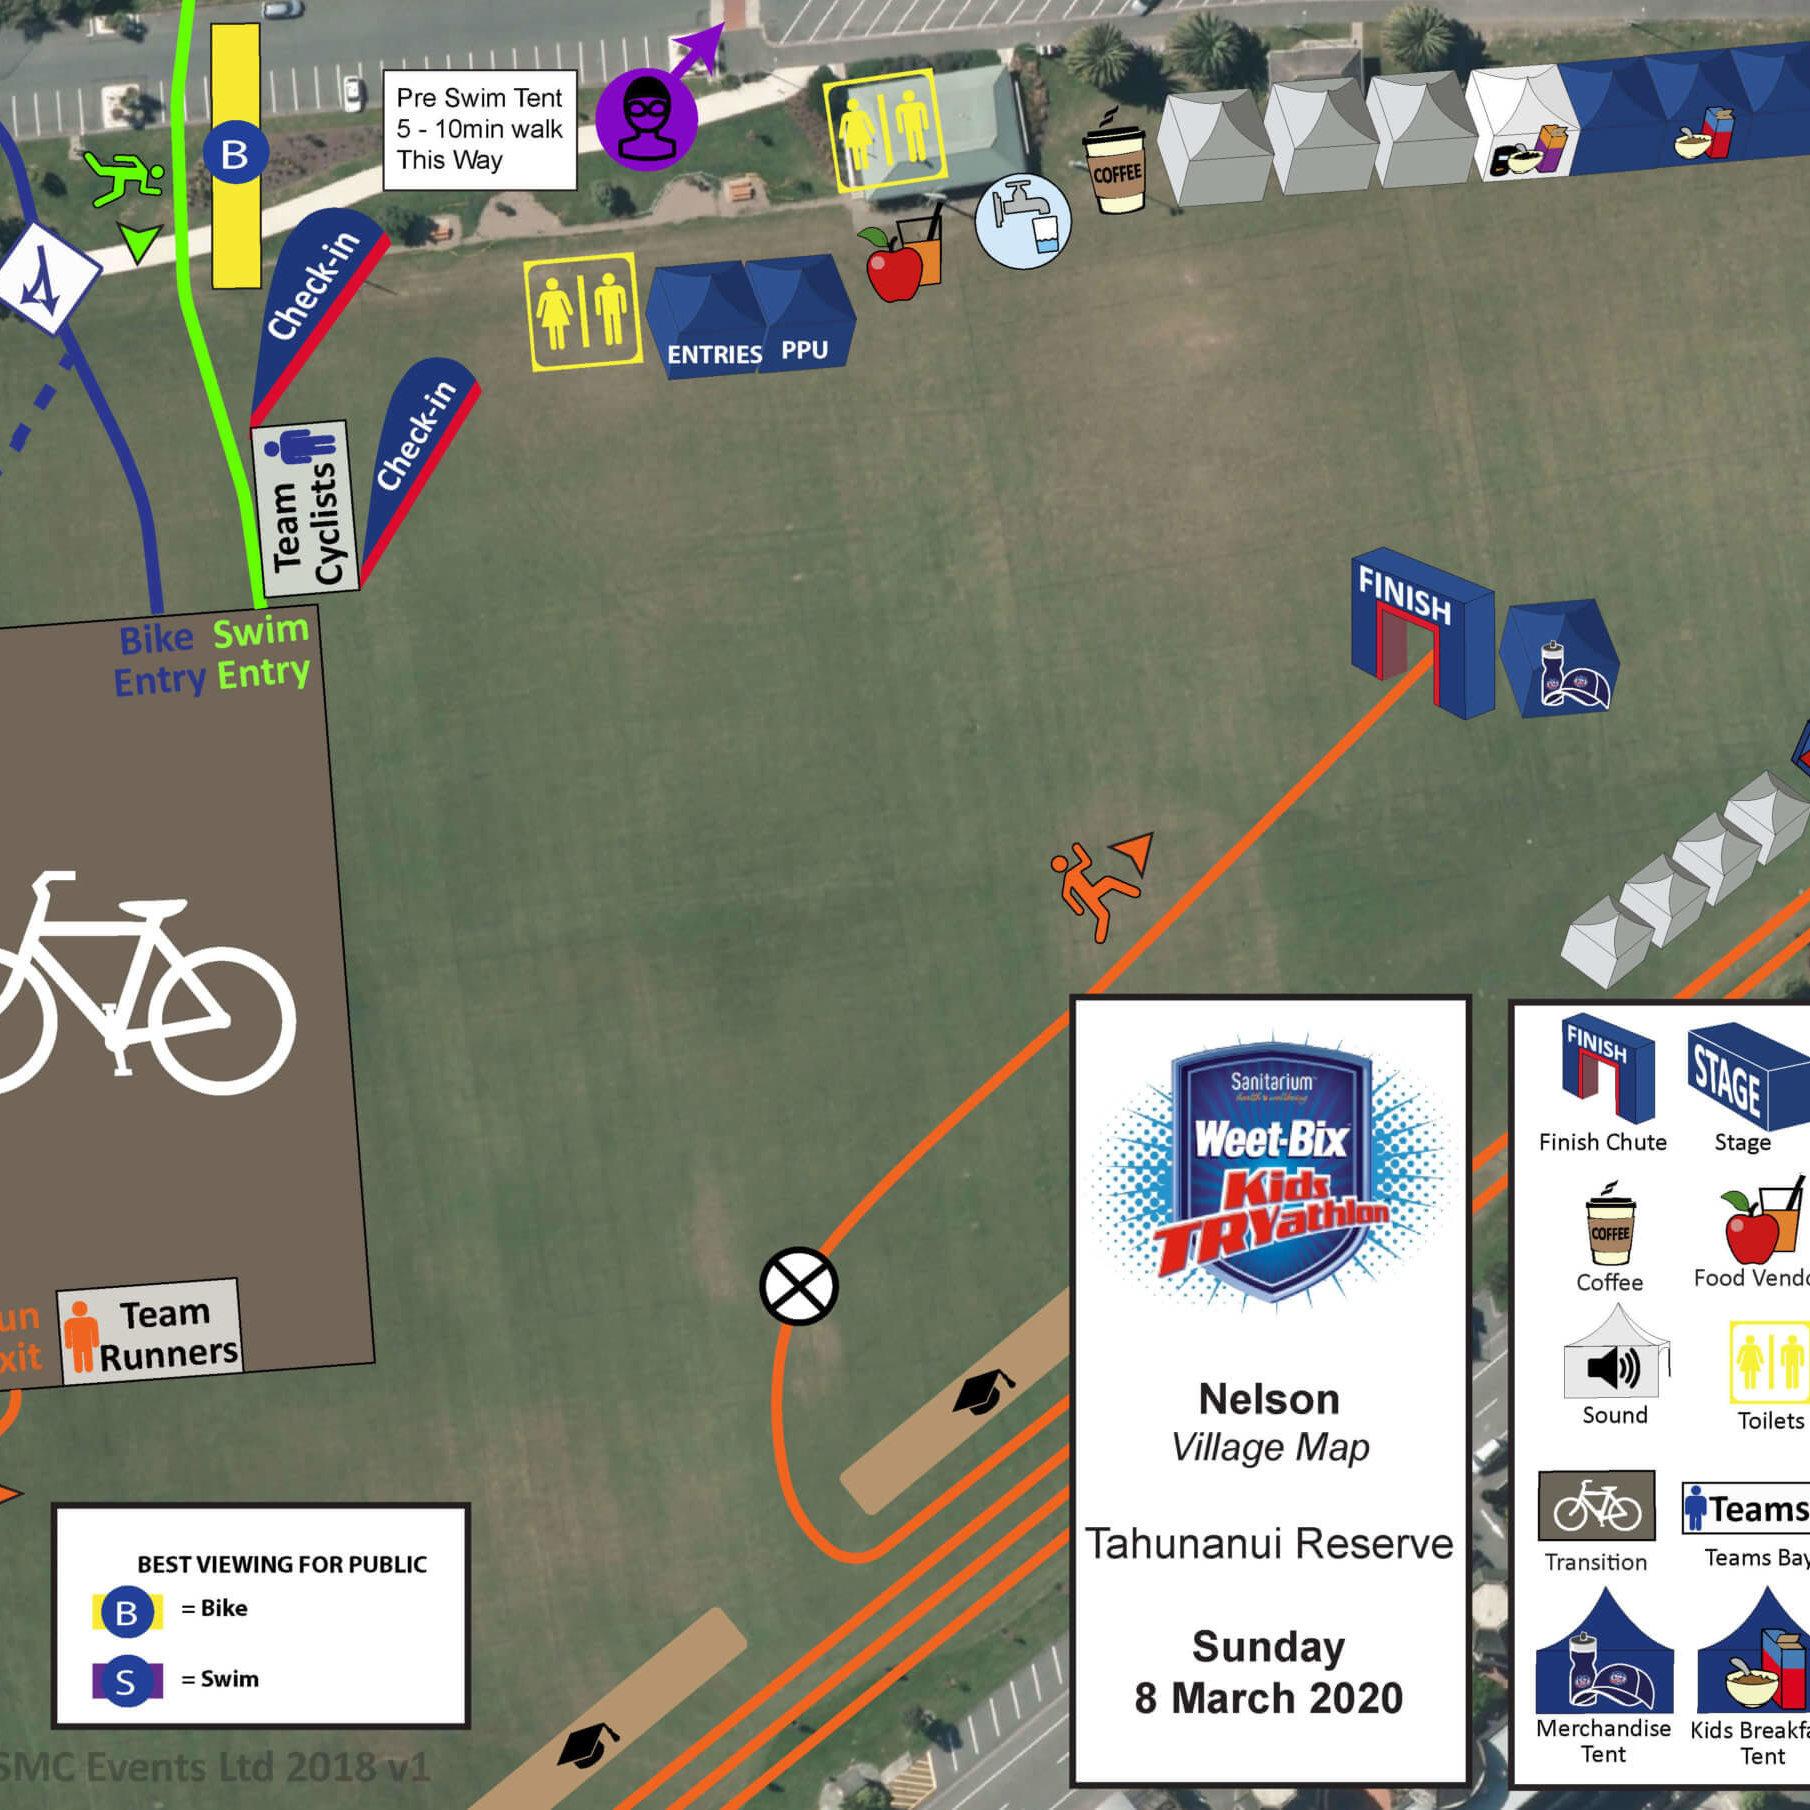 11 - SWBKT Nelson Village Map 2020 FINAL (1)